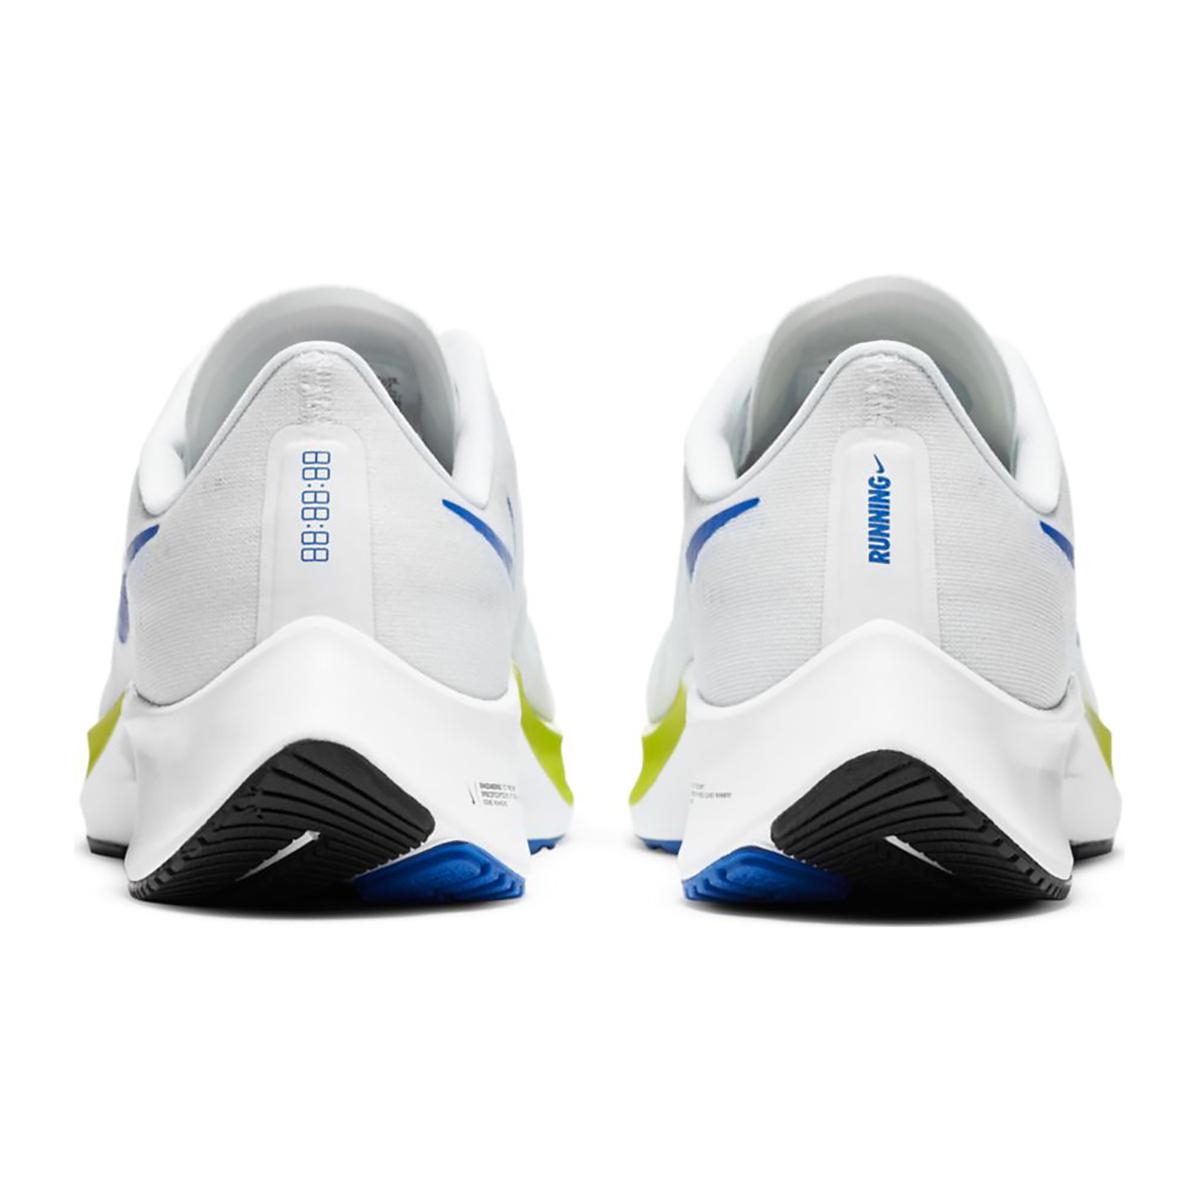 Men's Nike Air Zoom Pegasus 37 Running Shoe - Color: White/Racer Blue/Cyber/Black - Size: 6 - Width: Regular, White/Racer Blue/Cyber/Black, large, image 5